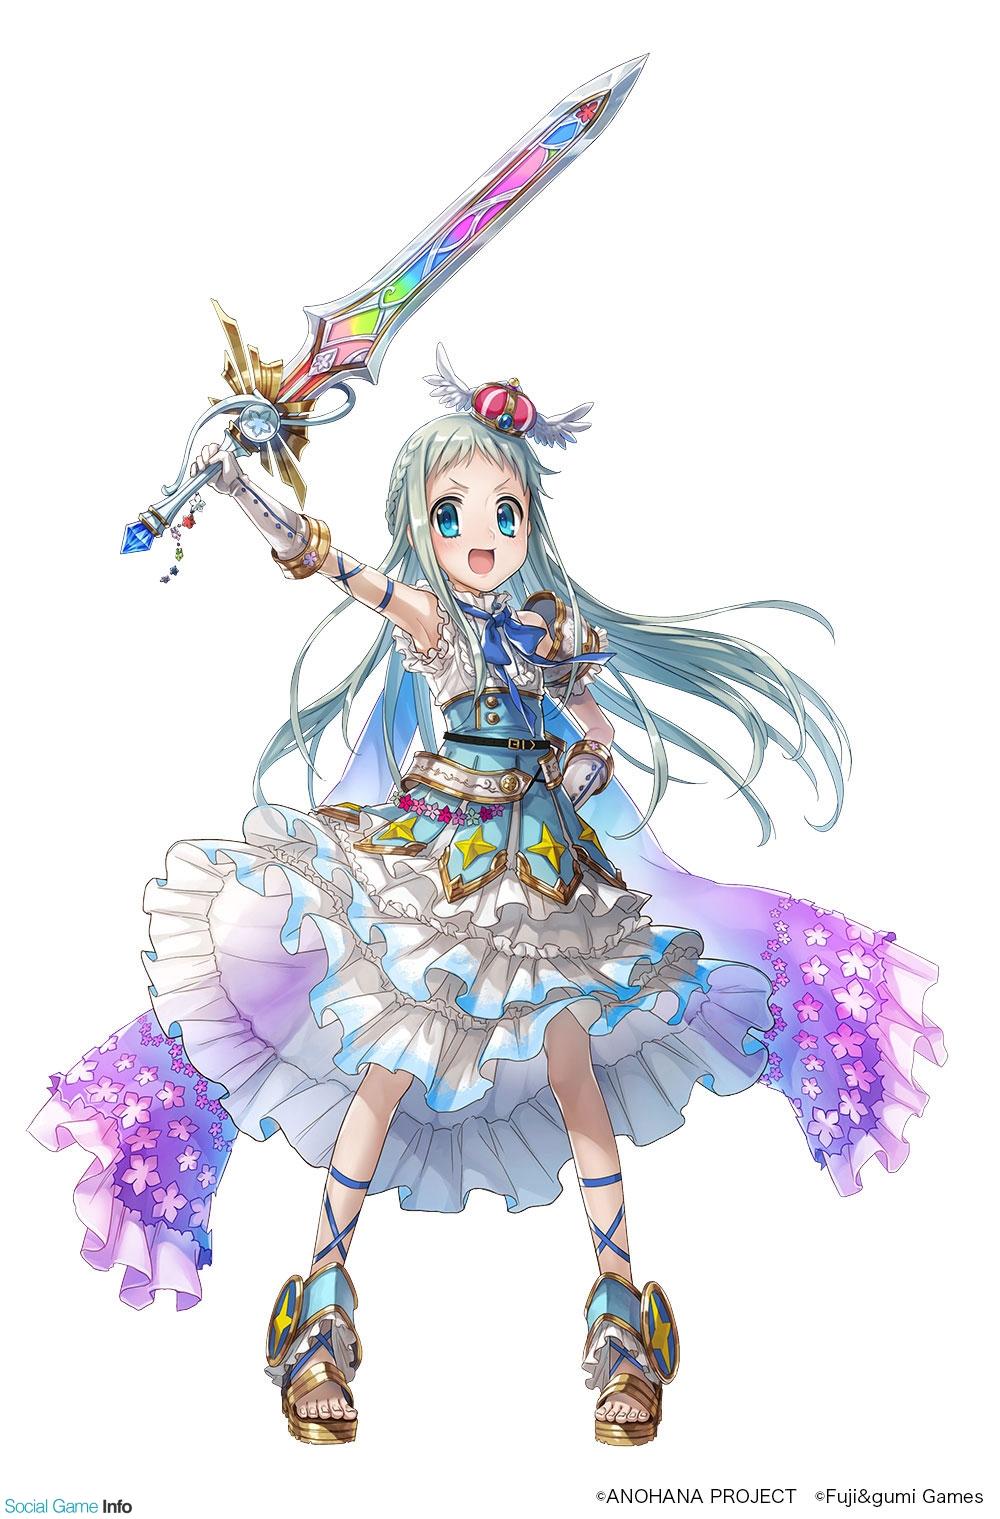 Gumi ファントム オブ キル がアニメ あの日見た花の名前を僕達はまだ知らない とのコラボイベントを復刻開催 Social Game Info